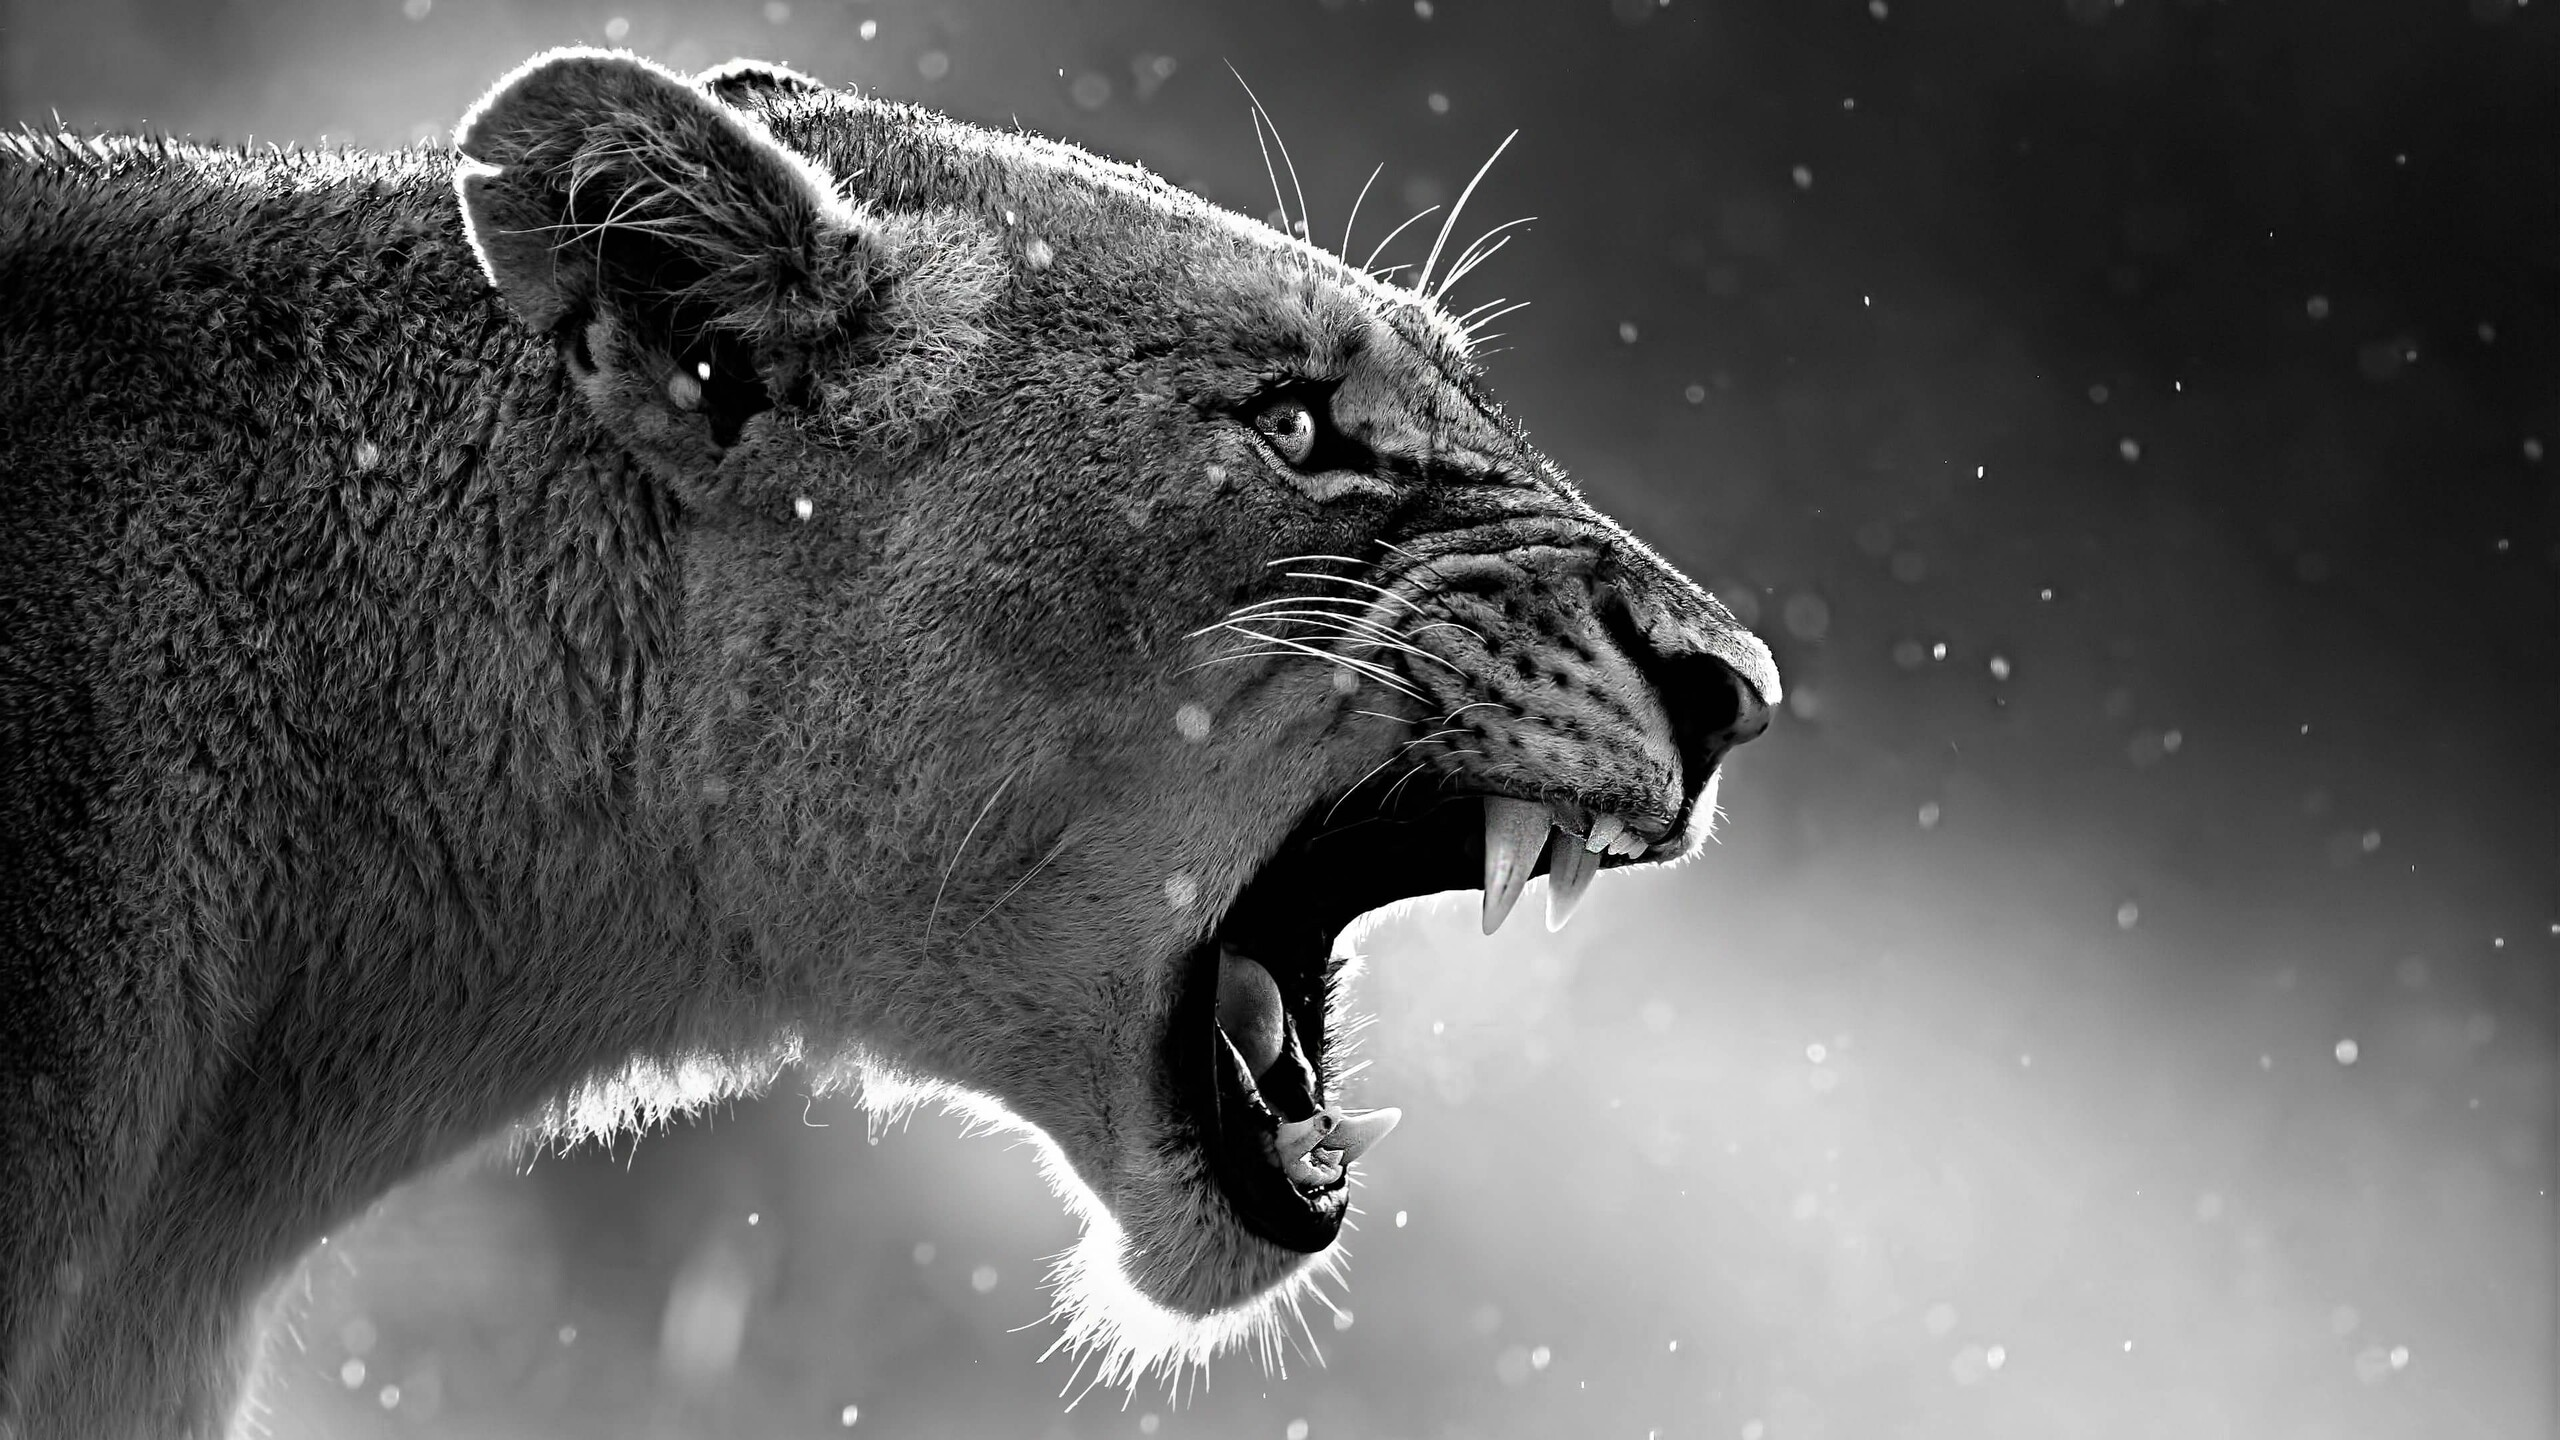 2560x1440 Lion Roaring 1440P Resolution HD 4k Wallpapers ...